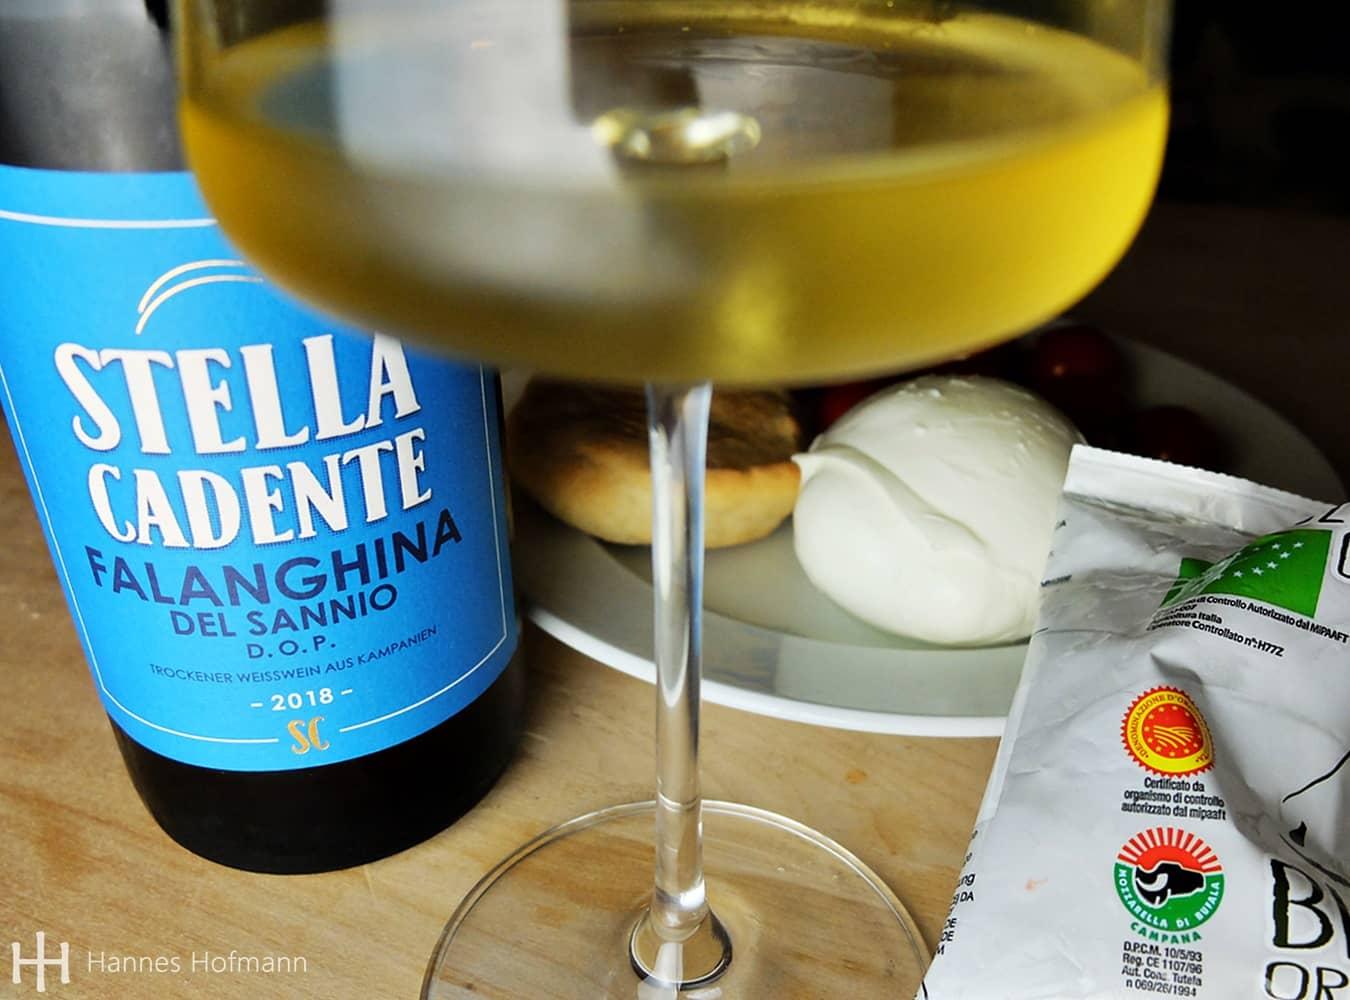 Stella Cadente - Falanghina del Sannio - 2018 - Kampanien